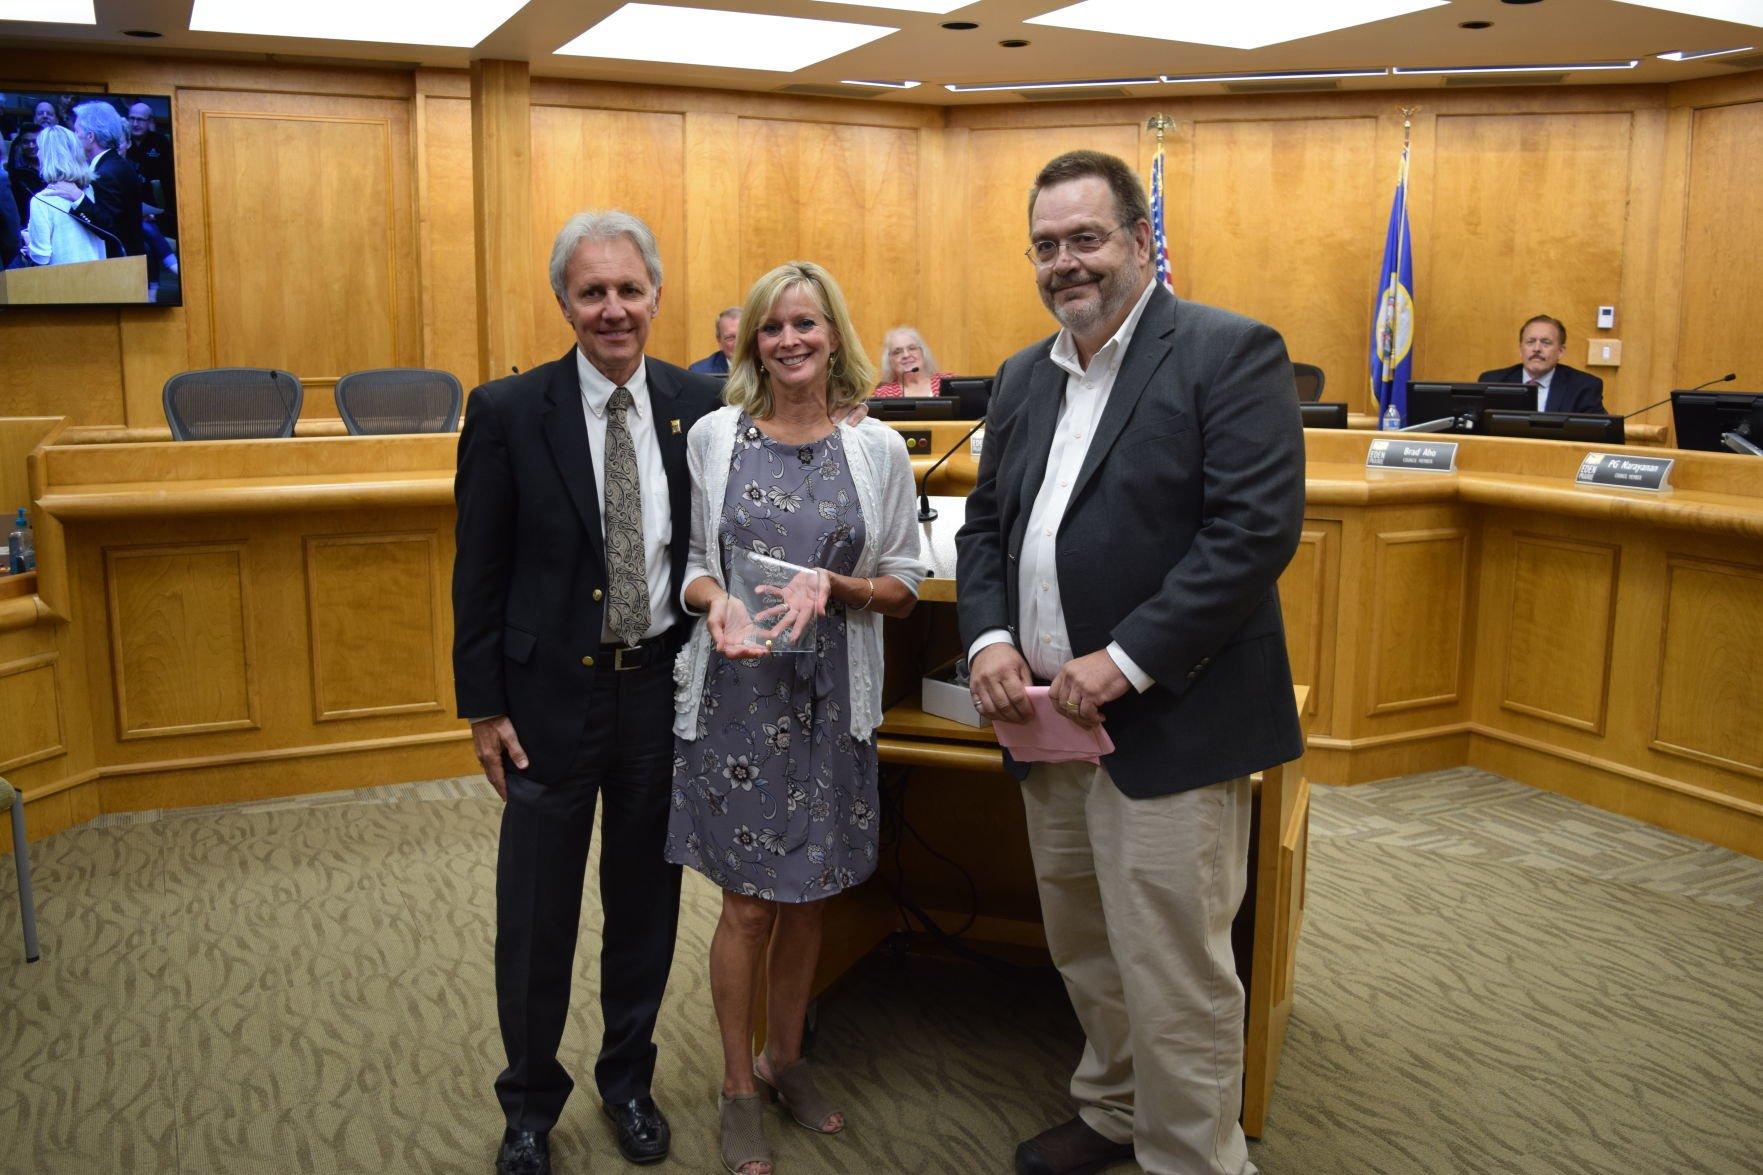 Kathie Case heritage award